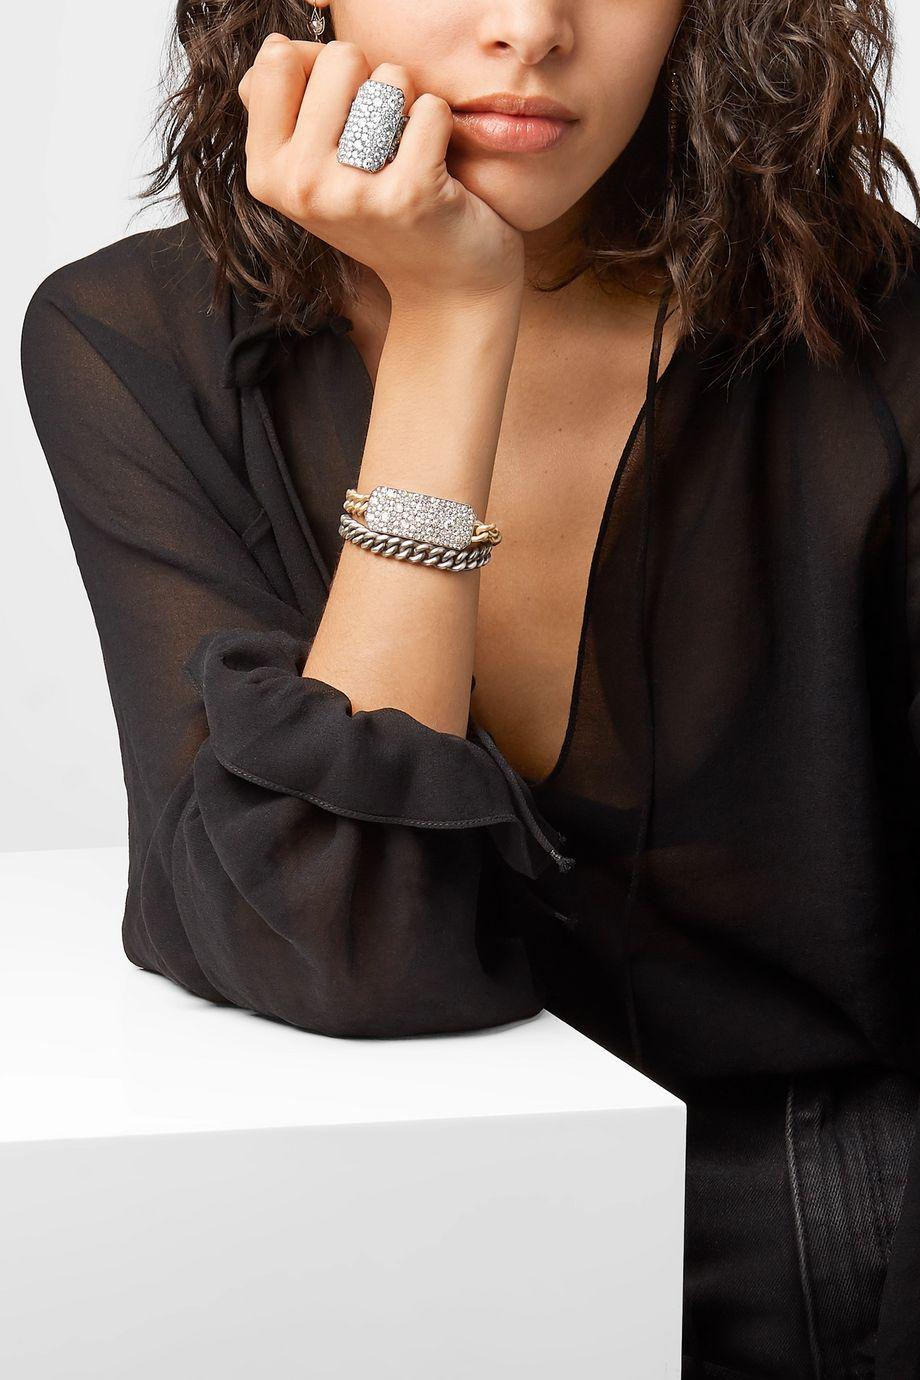 Sylva & Cie 18-karat white gold, sterling silver and diamond ring